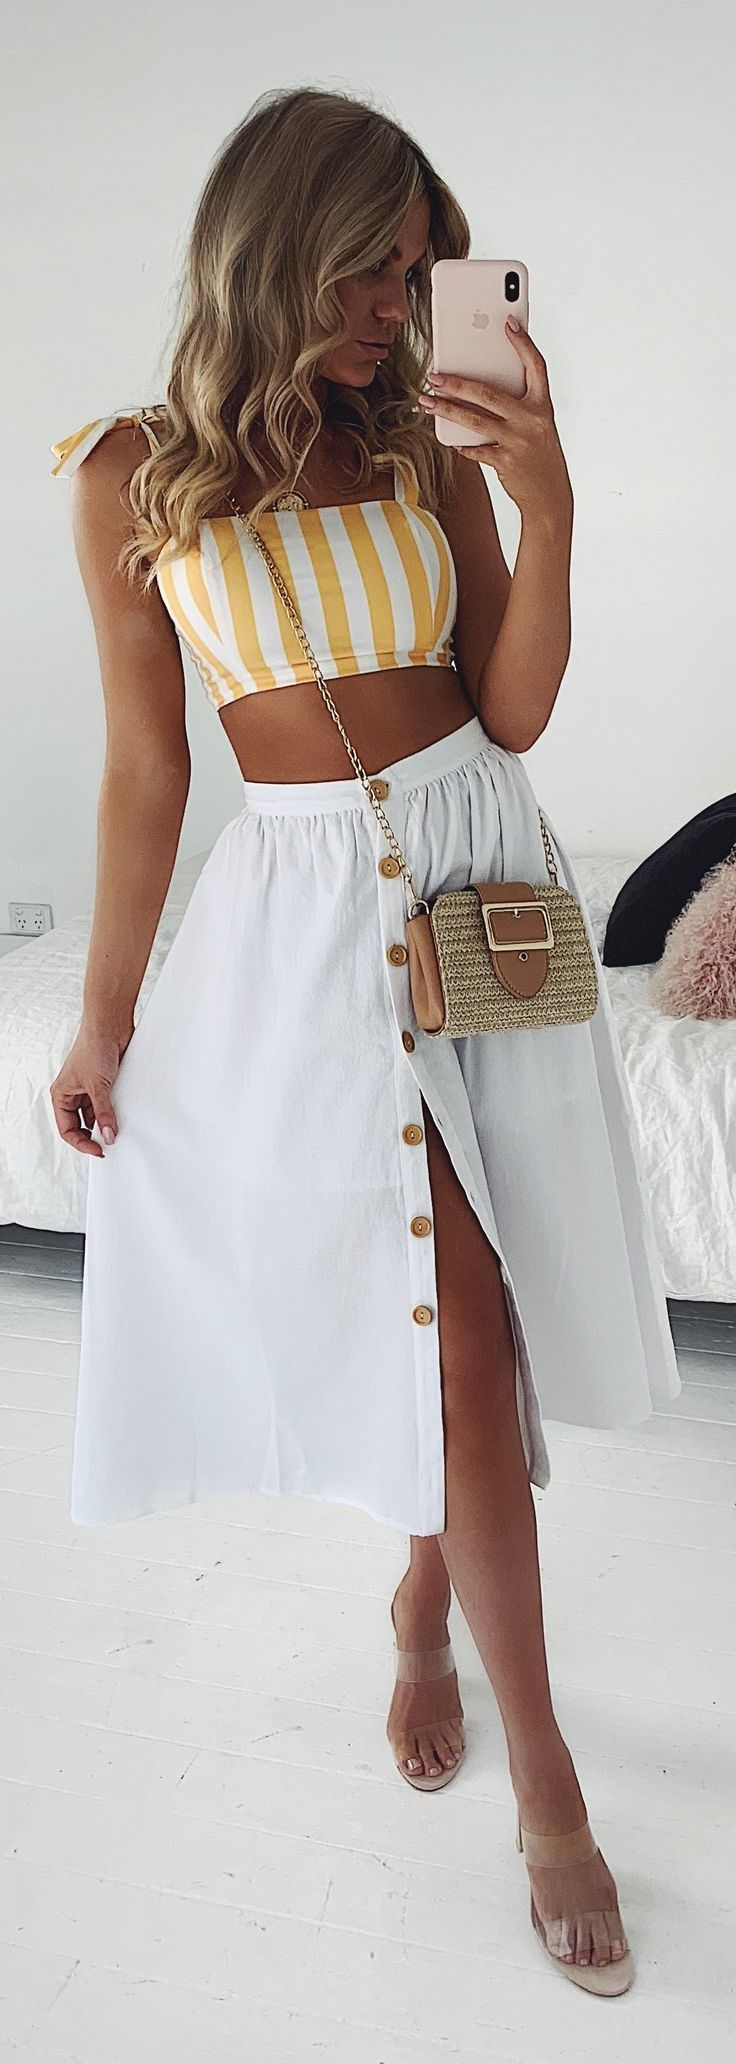 Skirts | Women's Mini, Midi & Maxi Skirts